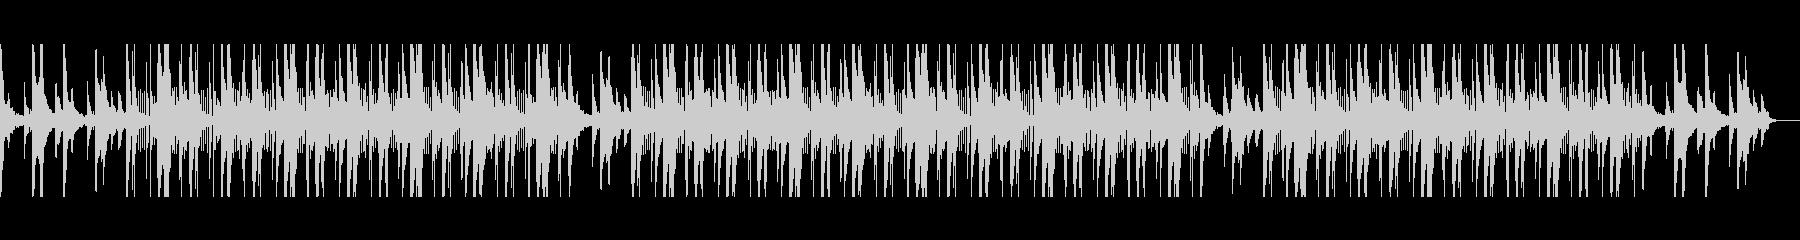 Lofi Hiphop 勉強用 切ないの未再生の波形